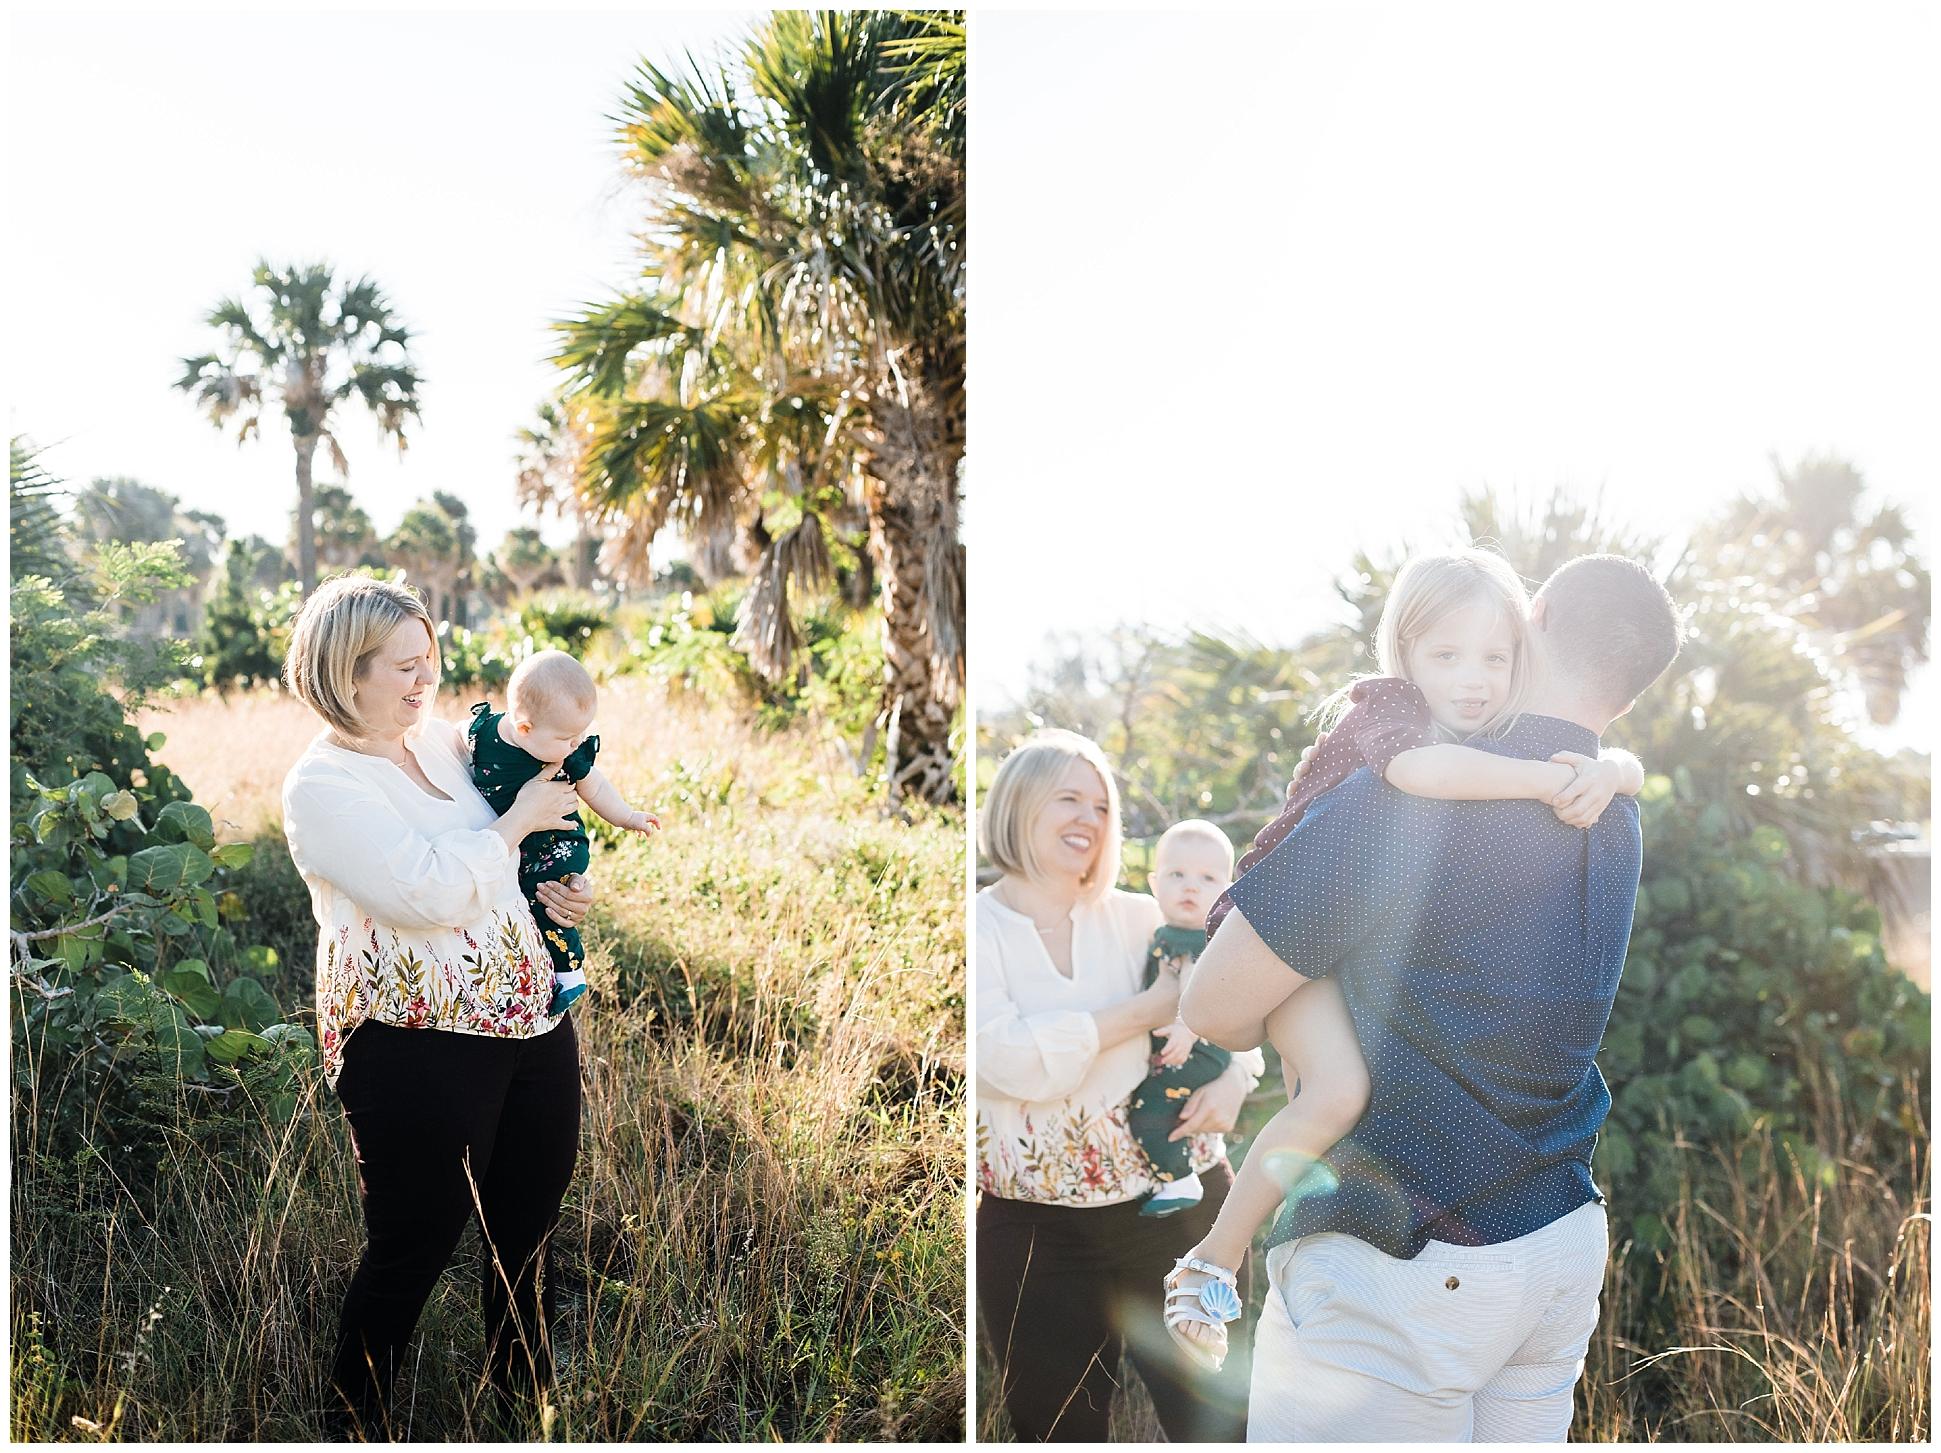 jessicafredericks_photography_family_beach_baby_clearwater_st pete beach_0001.jpg